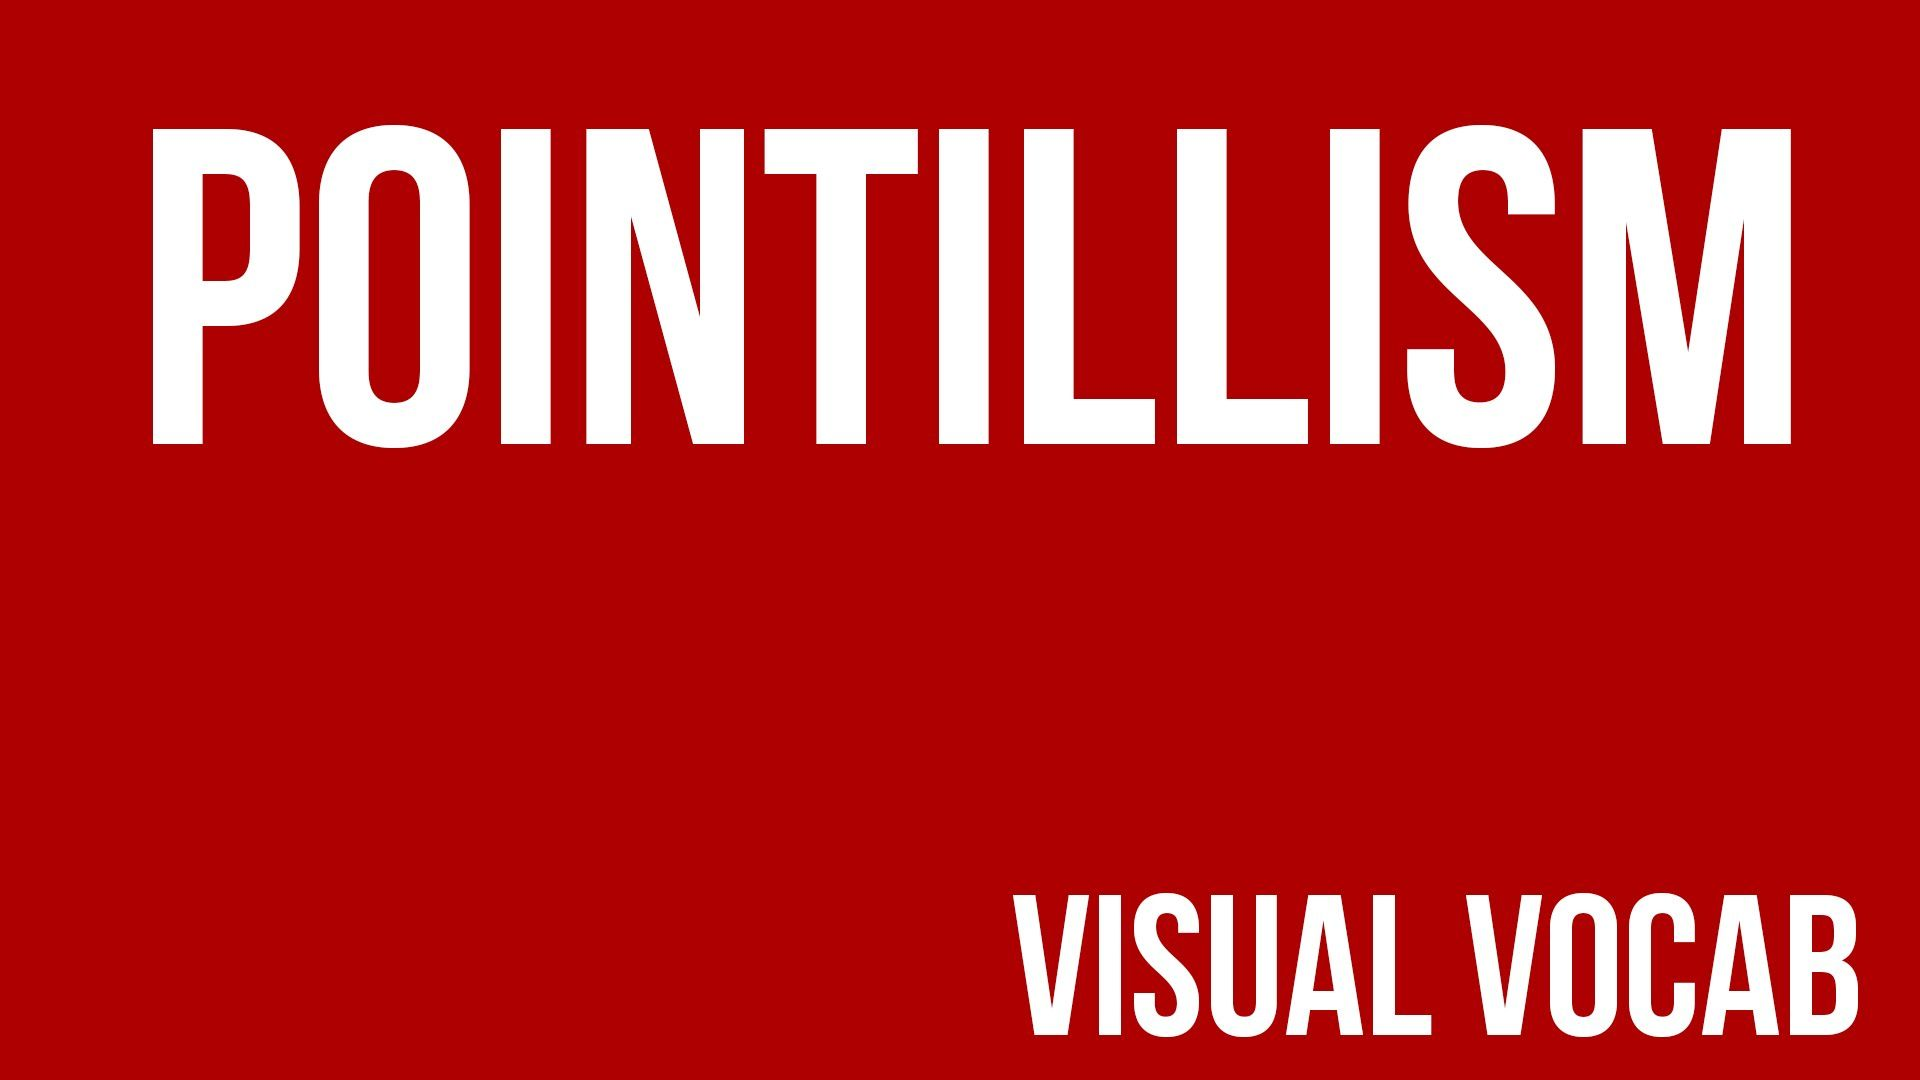 Pointillism defined - From Goodbye-Art Academy